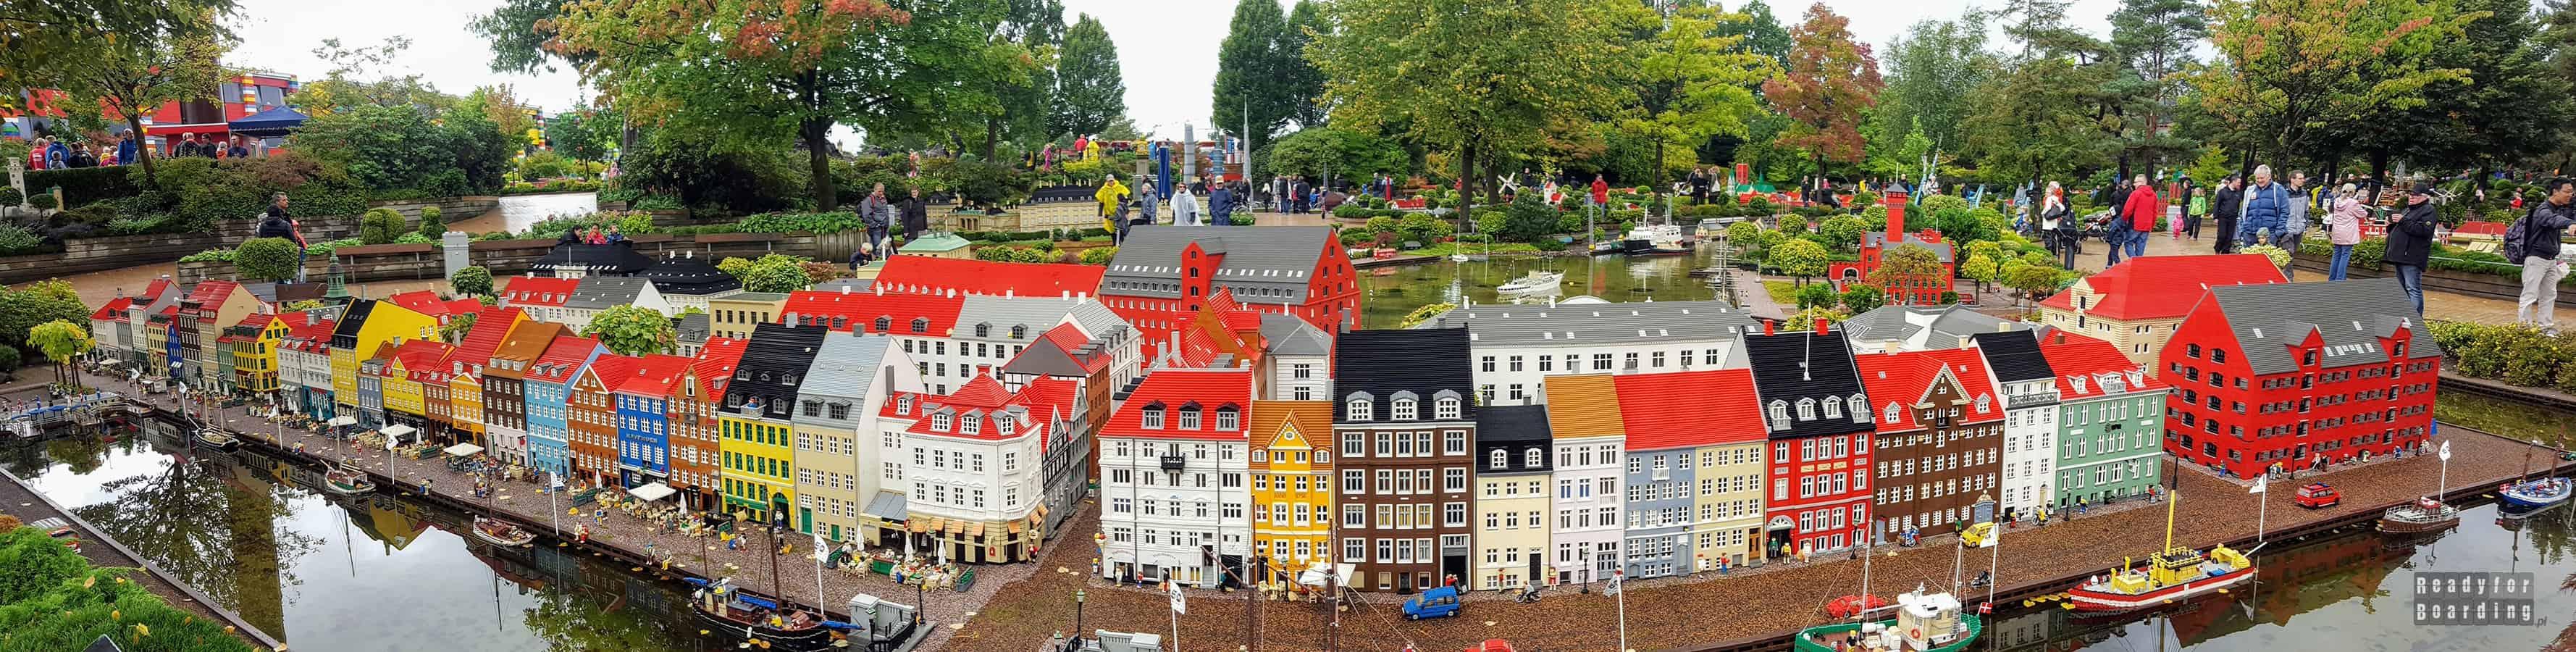 Panorama: Legoland Billund - Dania